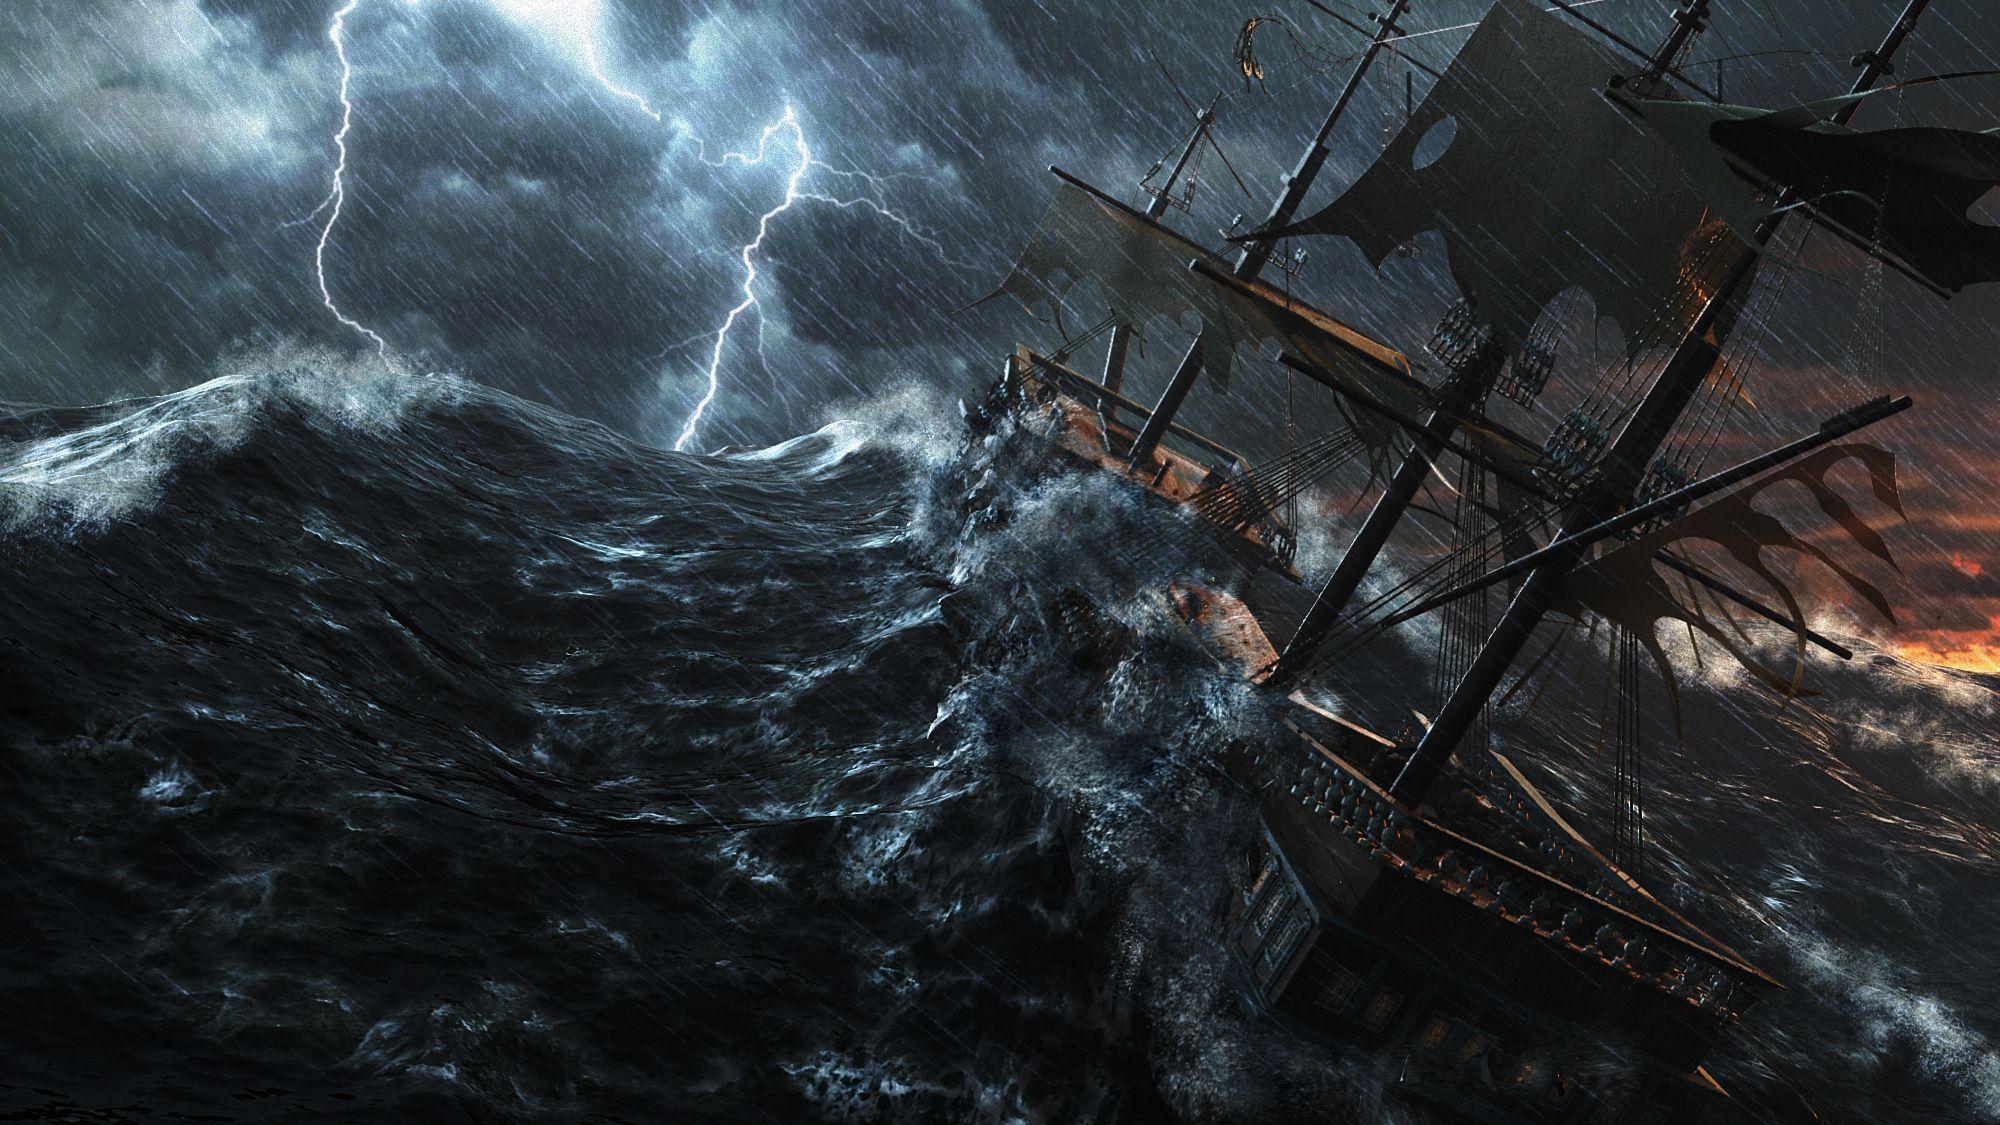 ship in storm tarzan pinterest storms